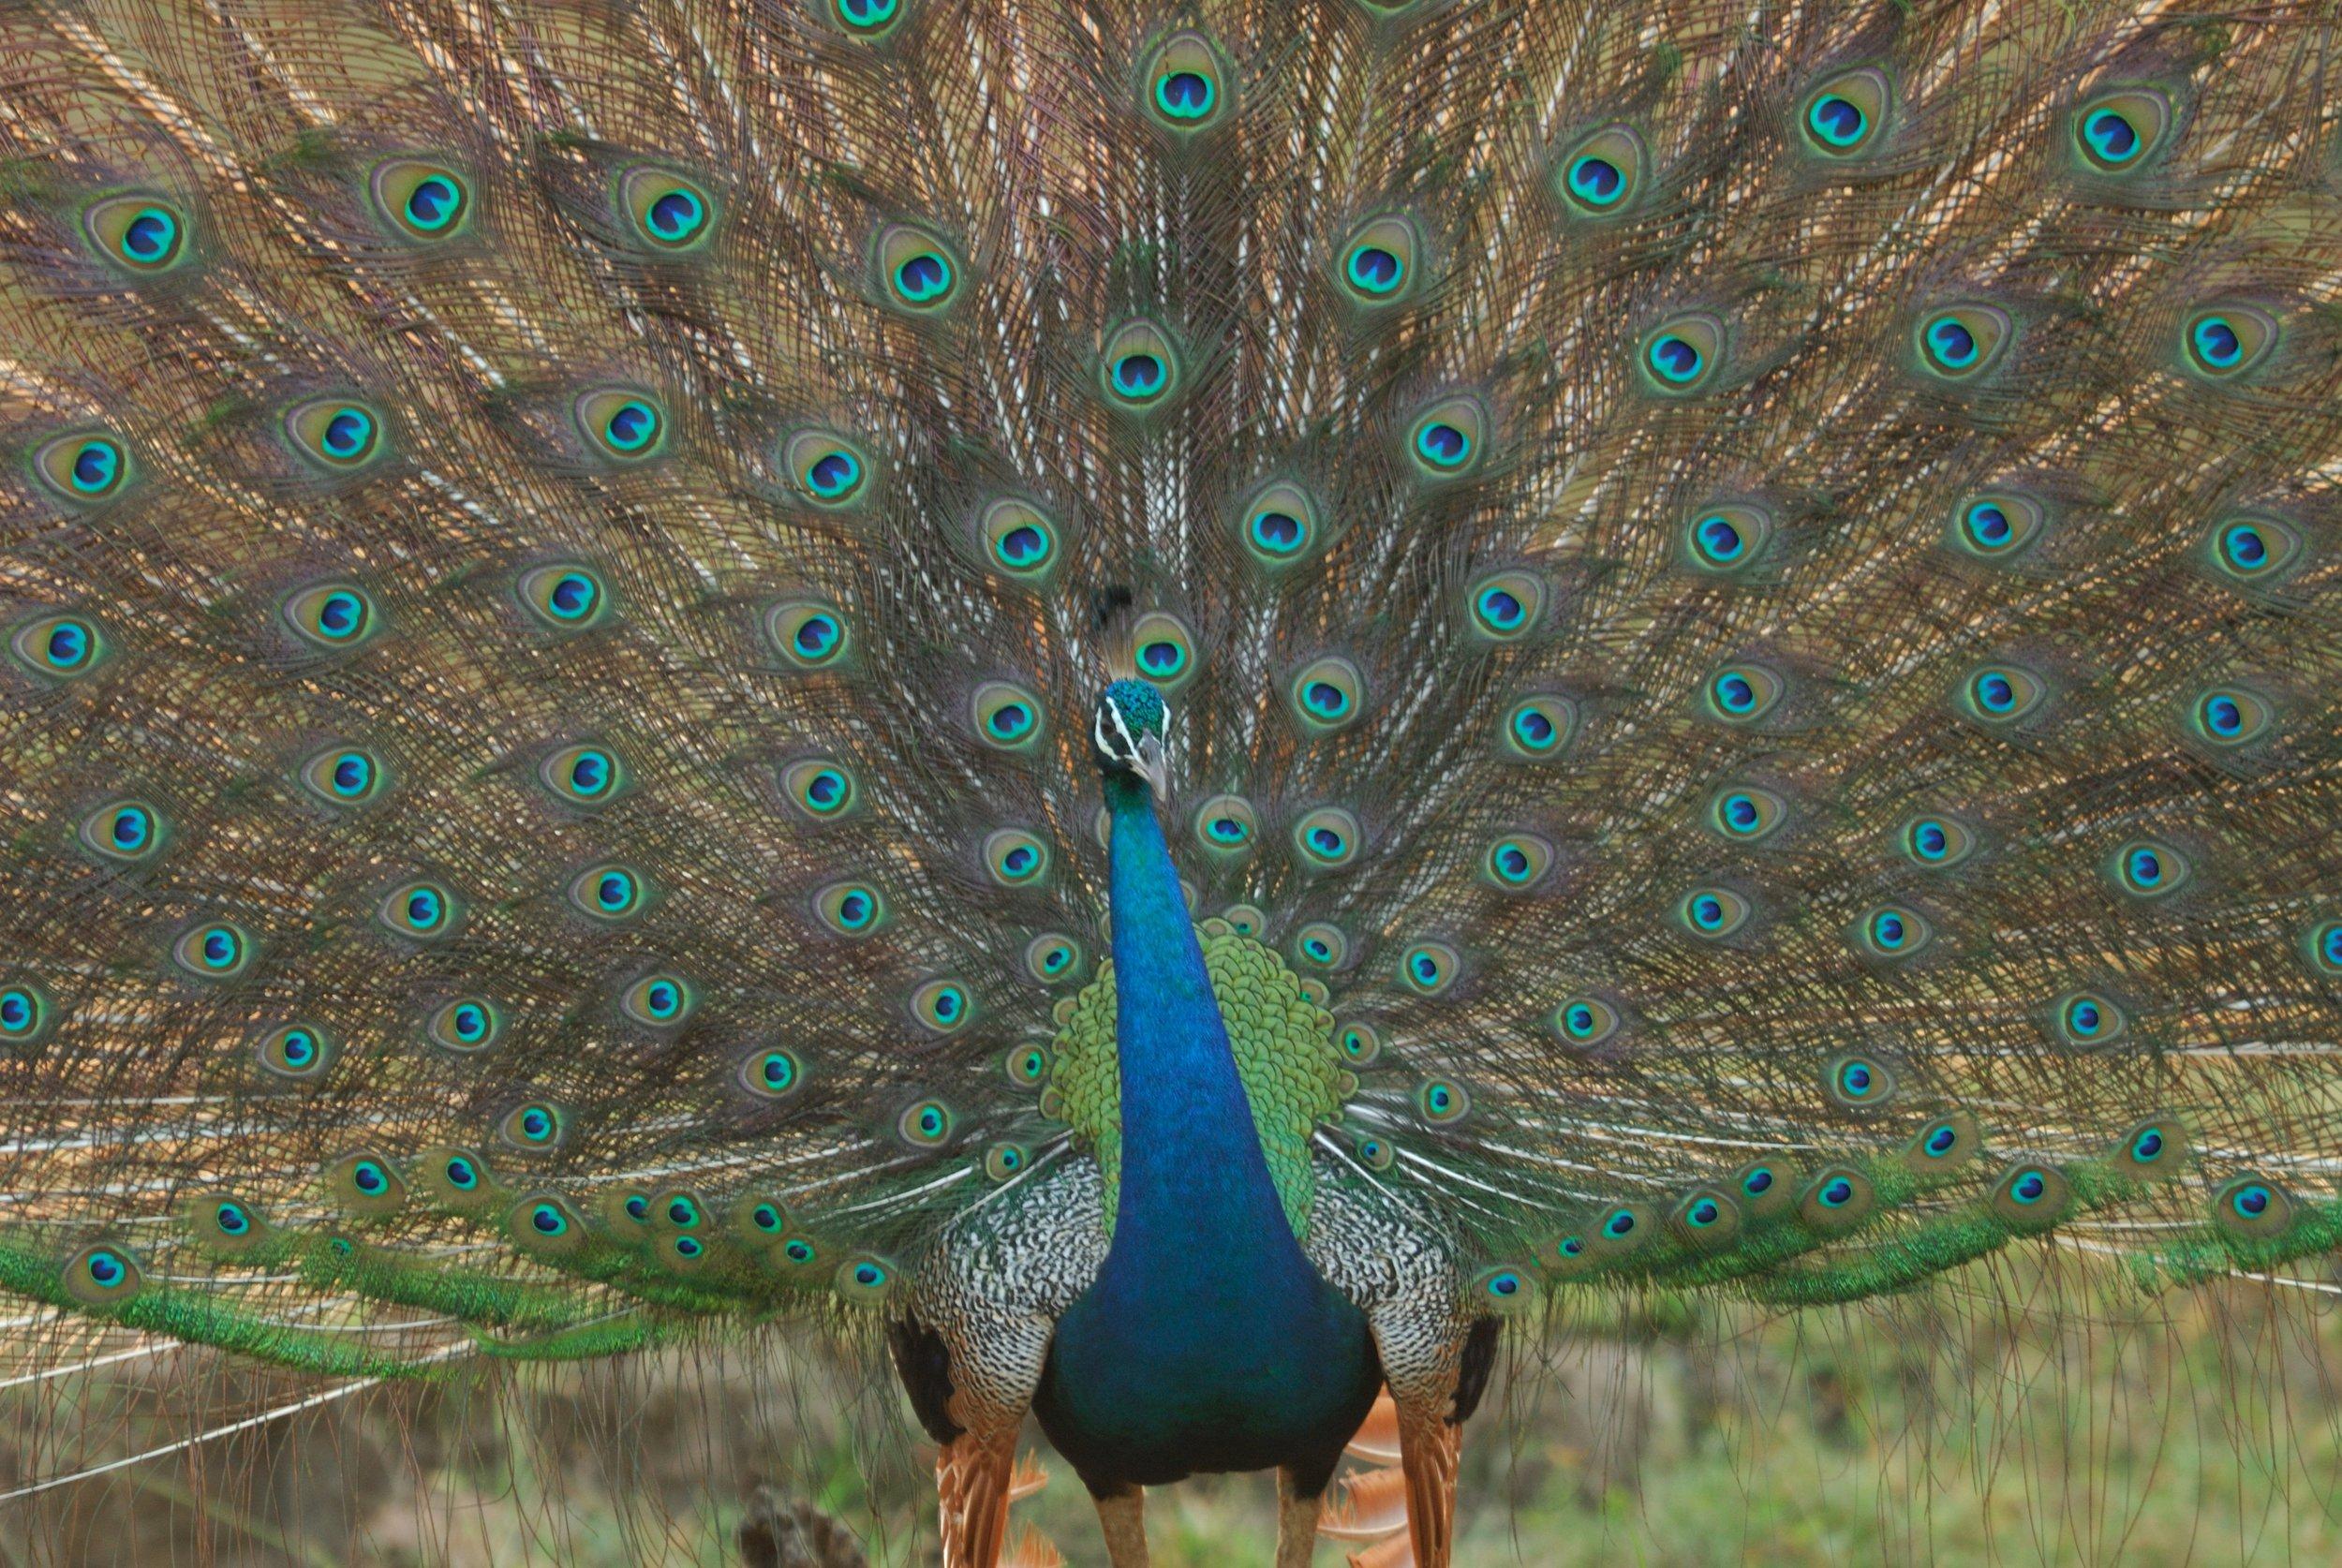 invite-to-paradise-sri-lanka-honeymoon-holiday-wildlife-safari-peacock-b.jpg